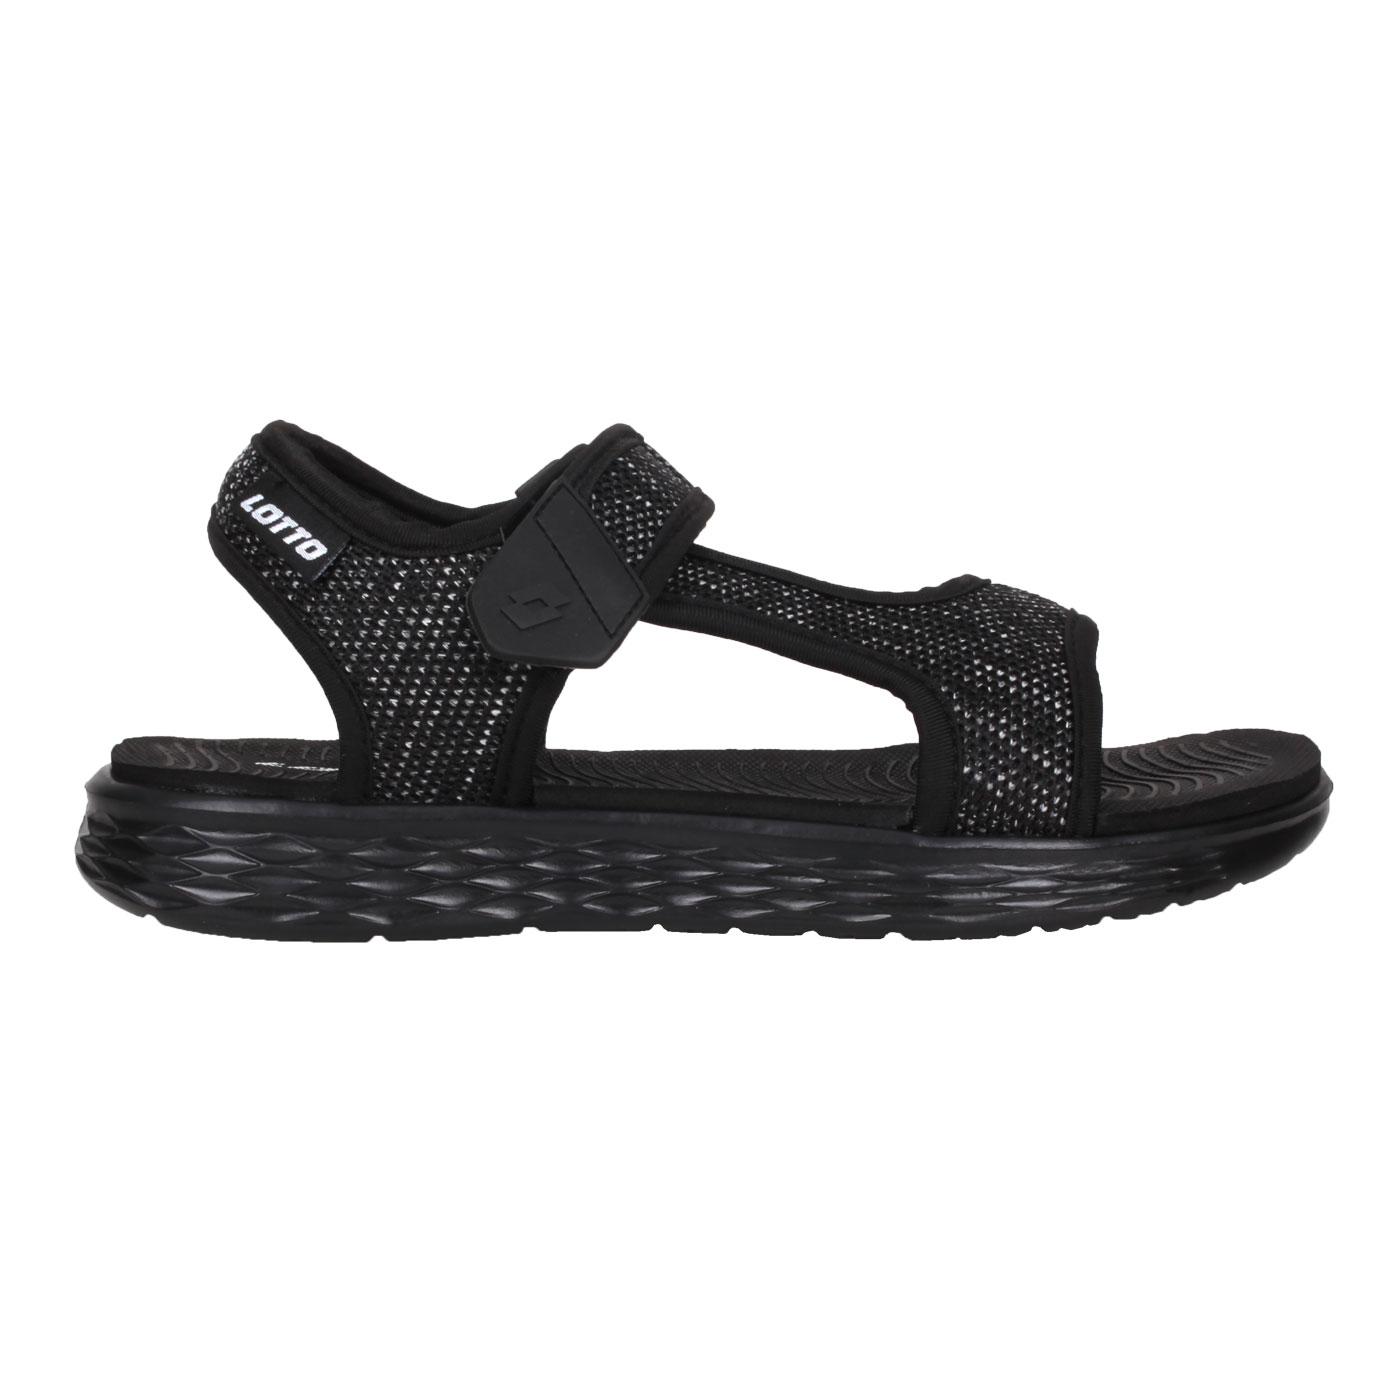 LOTTO 女款輕量涼鞋 LT1AWS3370 - 黑白